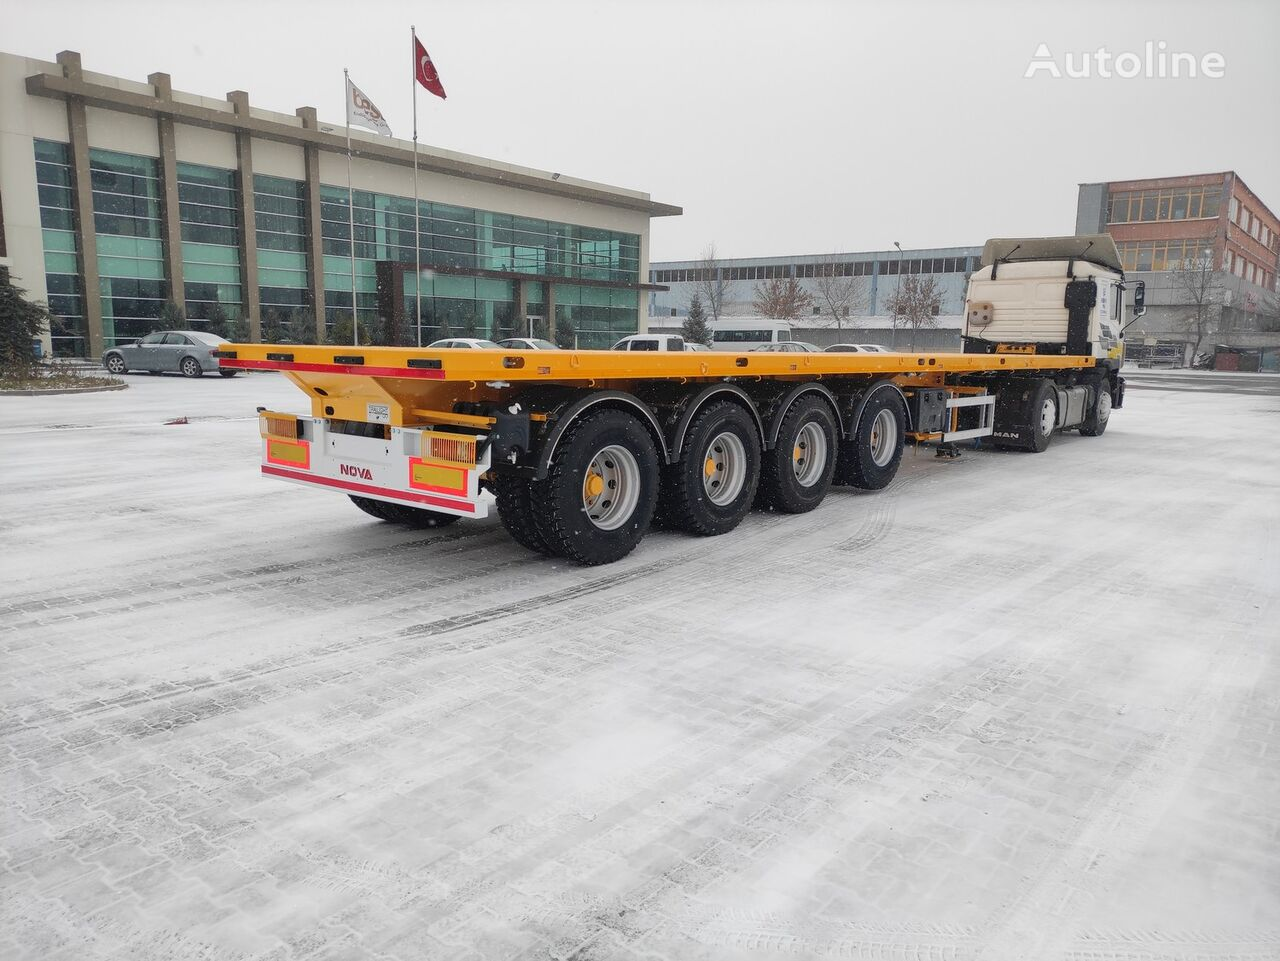 new NOVA FLATBED TRAILER 4 AXLE PRODUCTION platform semi-trailer  platform semi-trailer